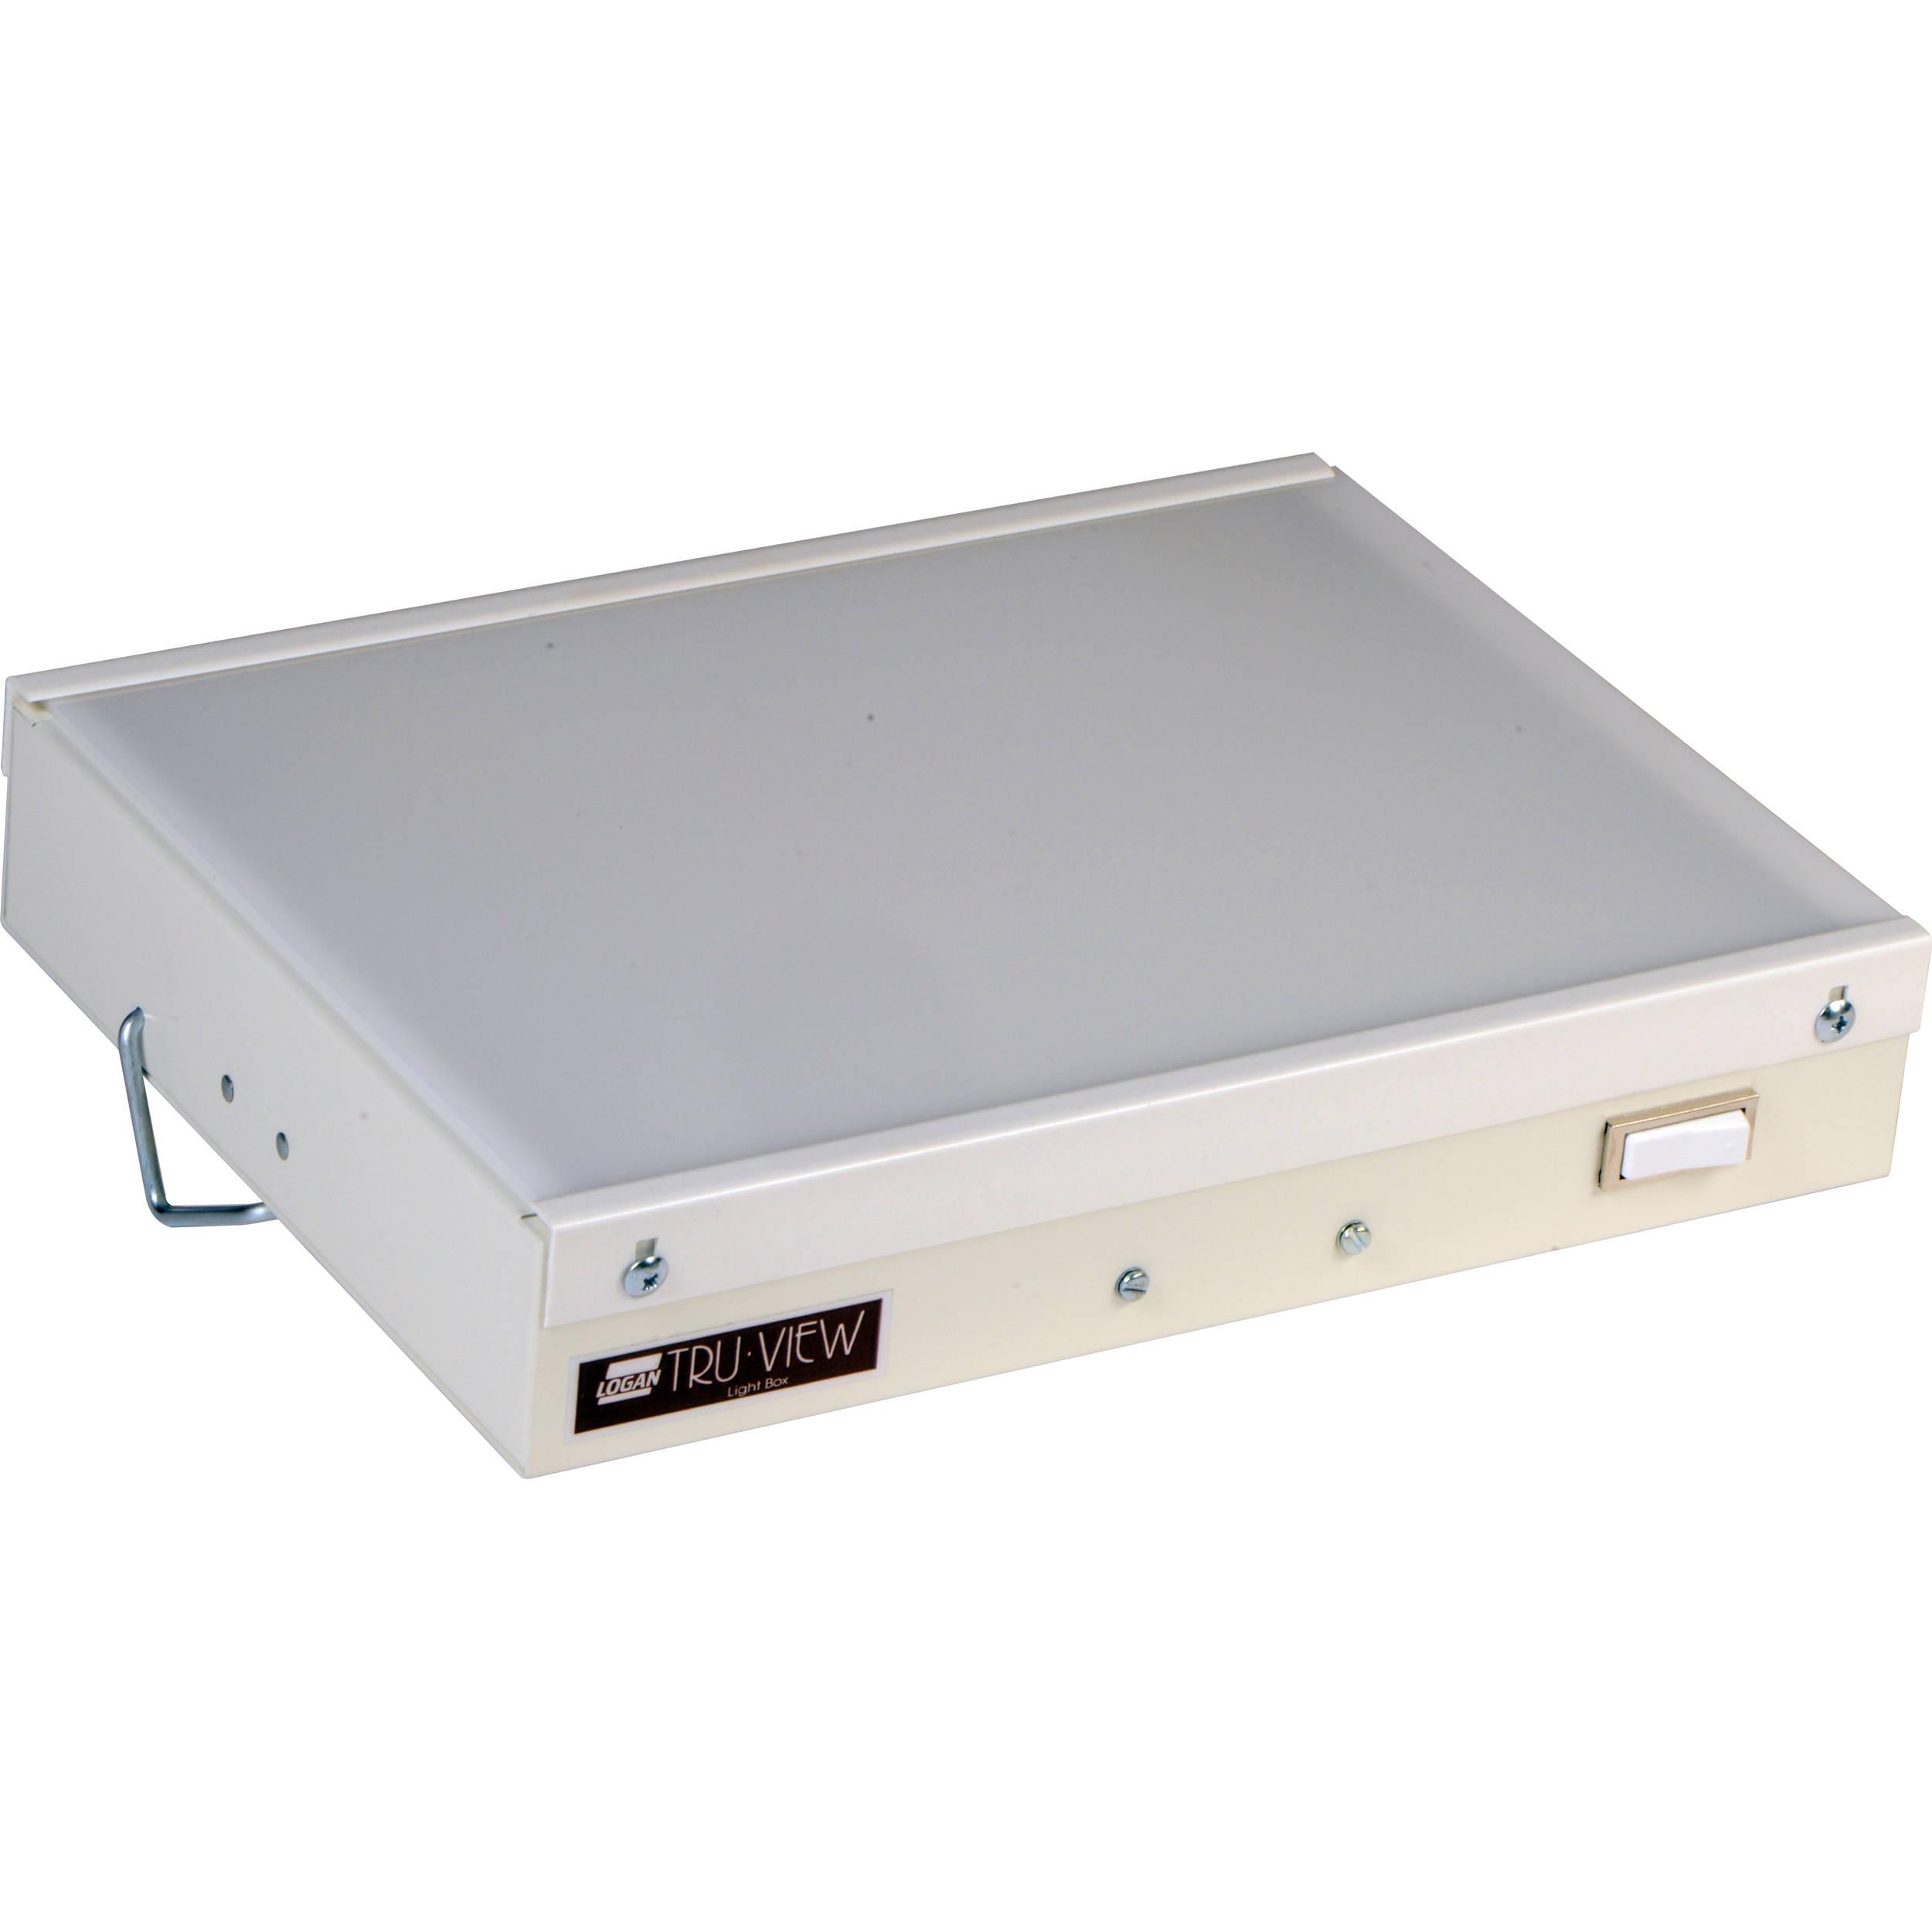 Logan Electric 8 X 10 Quot Desk Top Light Box 750428 B Amp H Photo